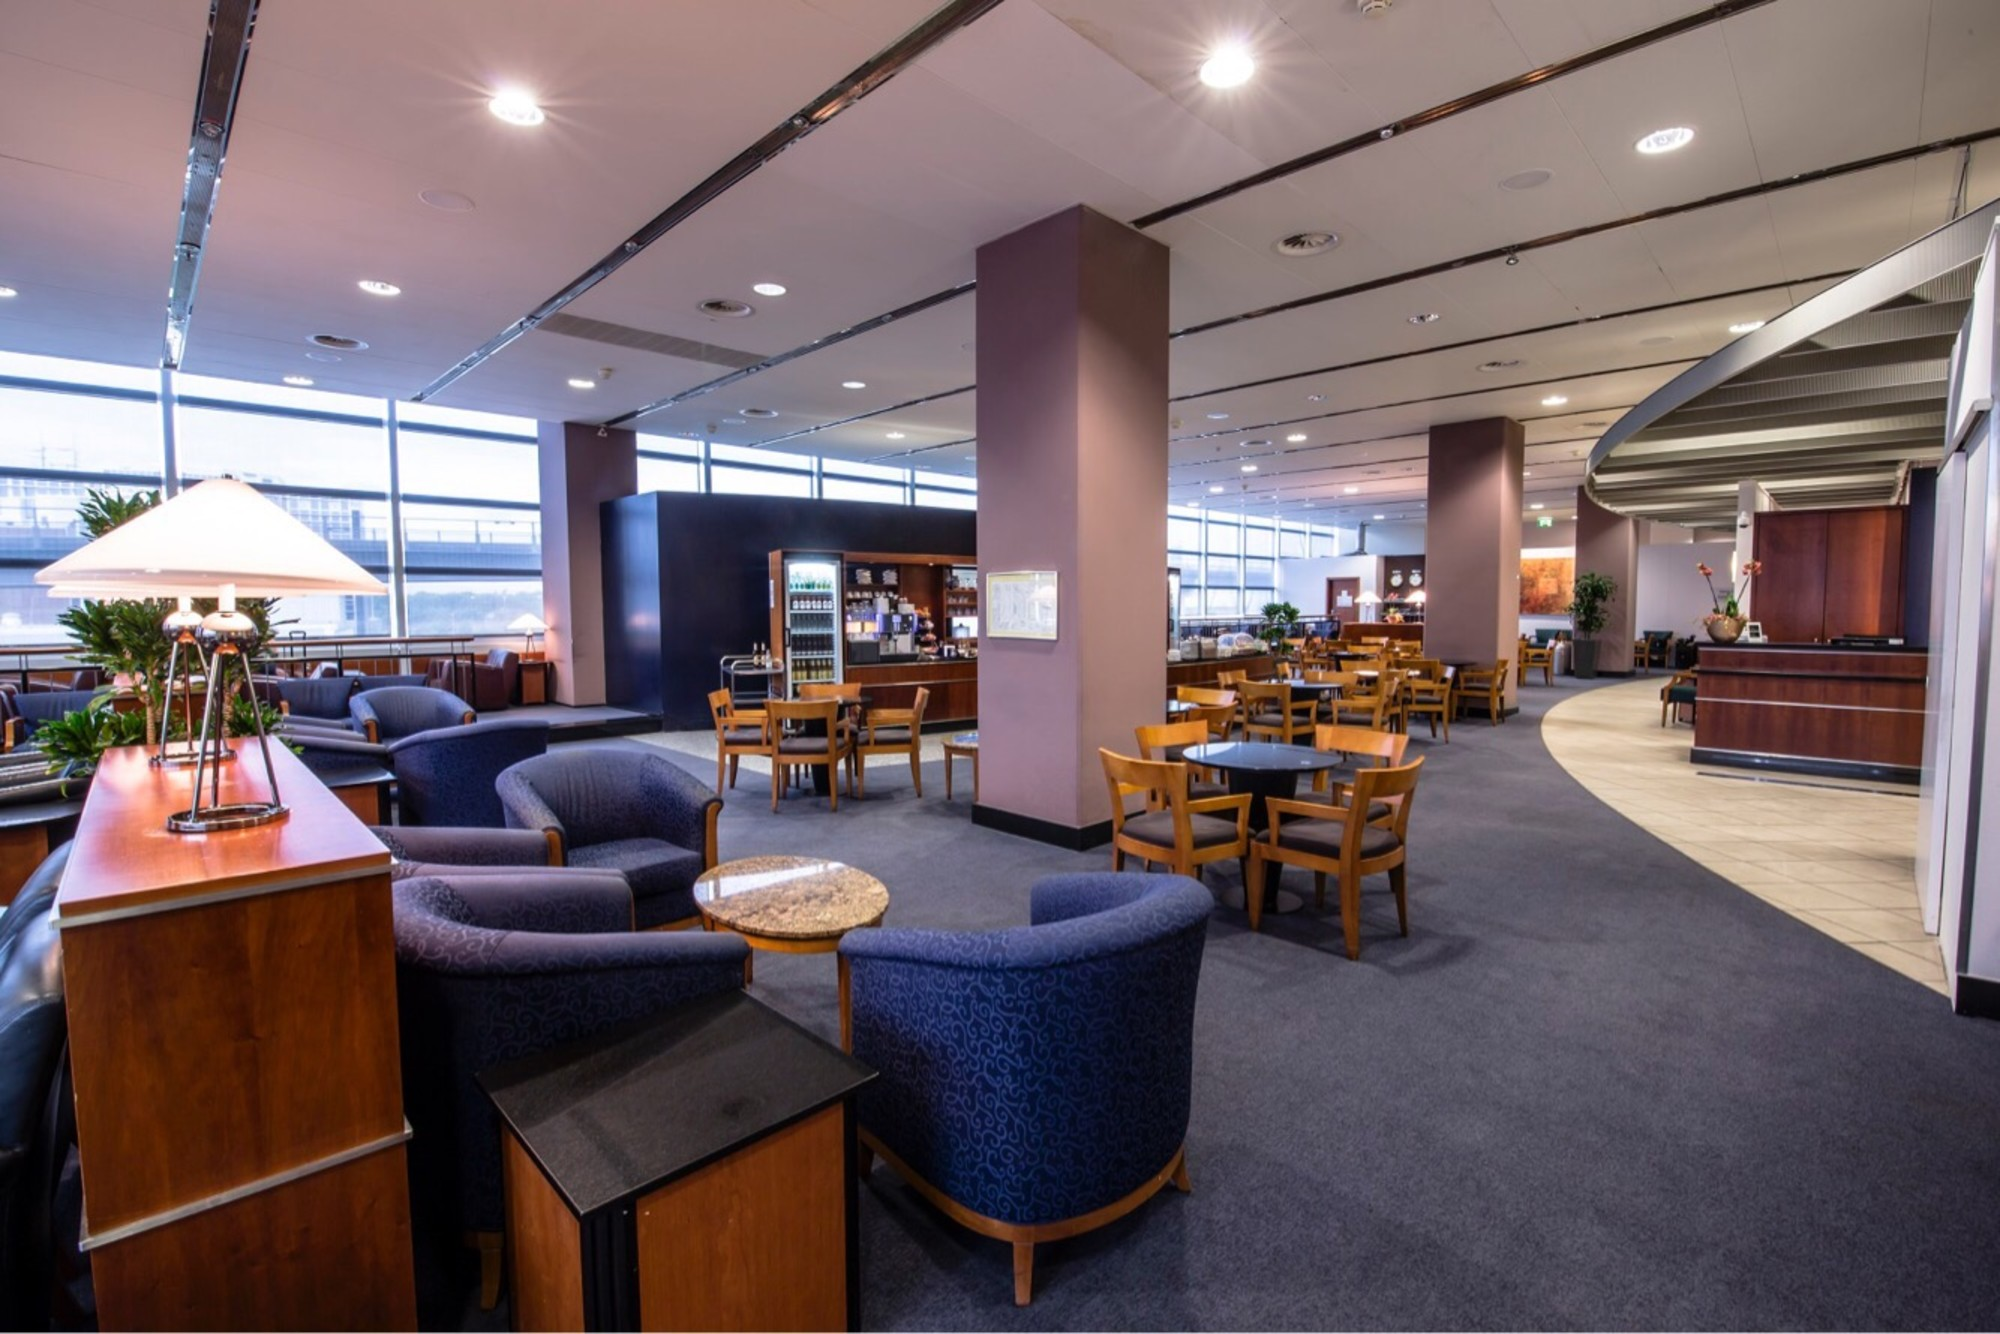 fra sky lounge reviews photos terminal 2 concourse d. Black Bedroom Furniture Sets. Home Design Ideas